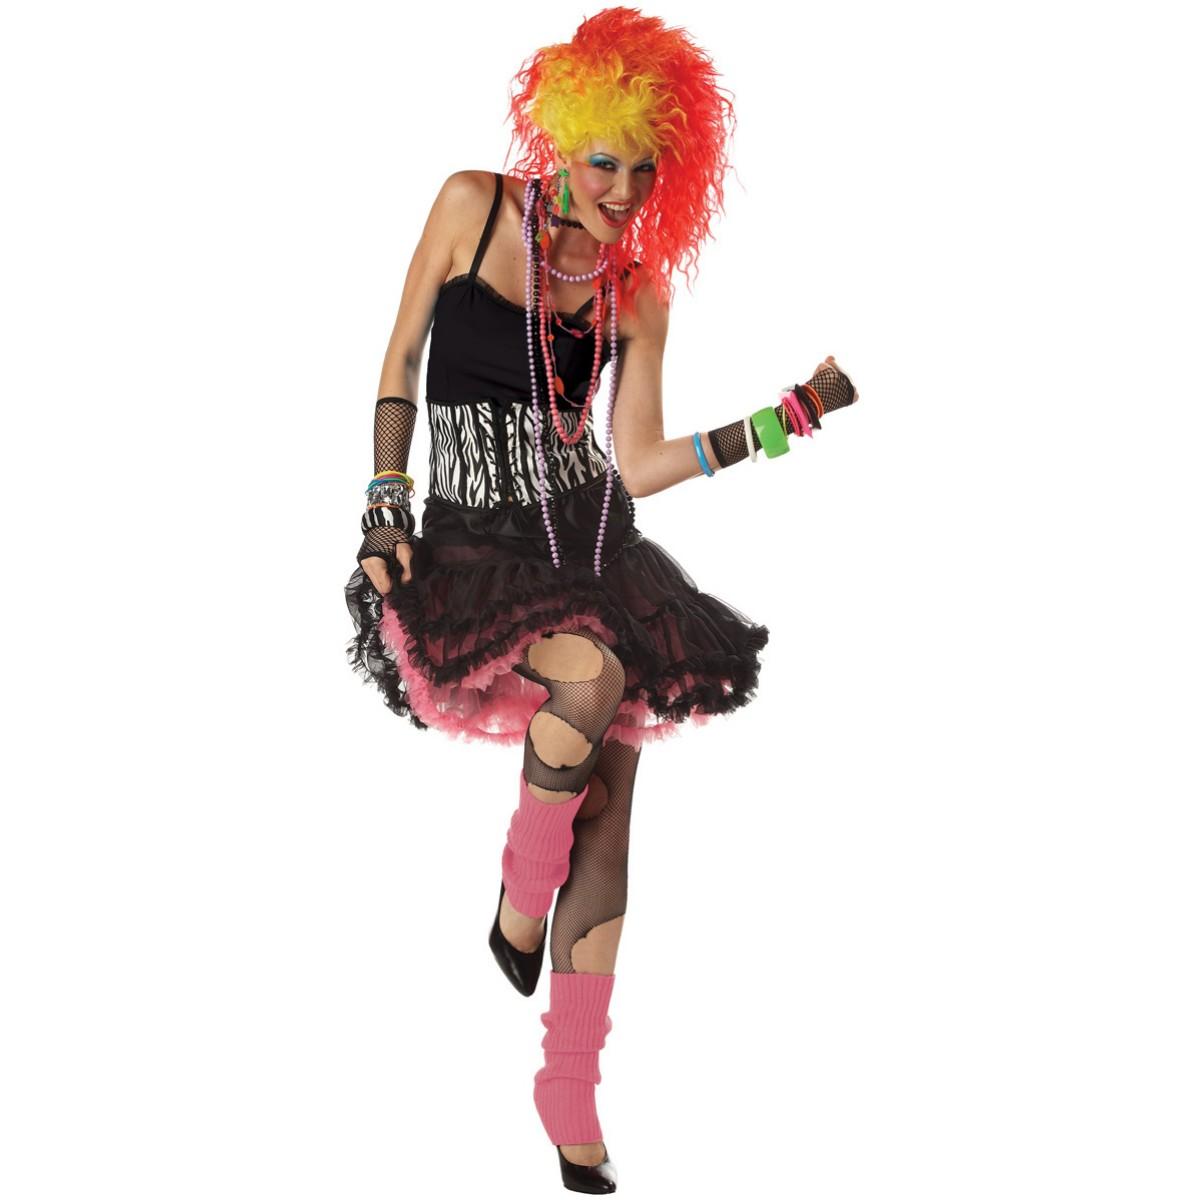 ... Party Girl Cyndi Lauper Disco Diva Fancy Dress Adult Costume | eBay